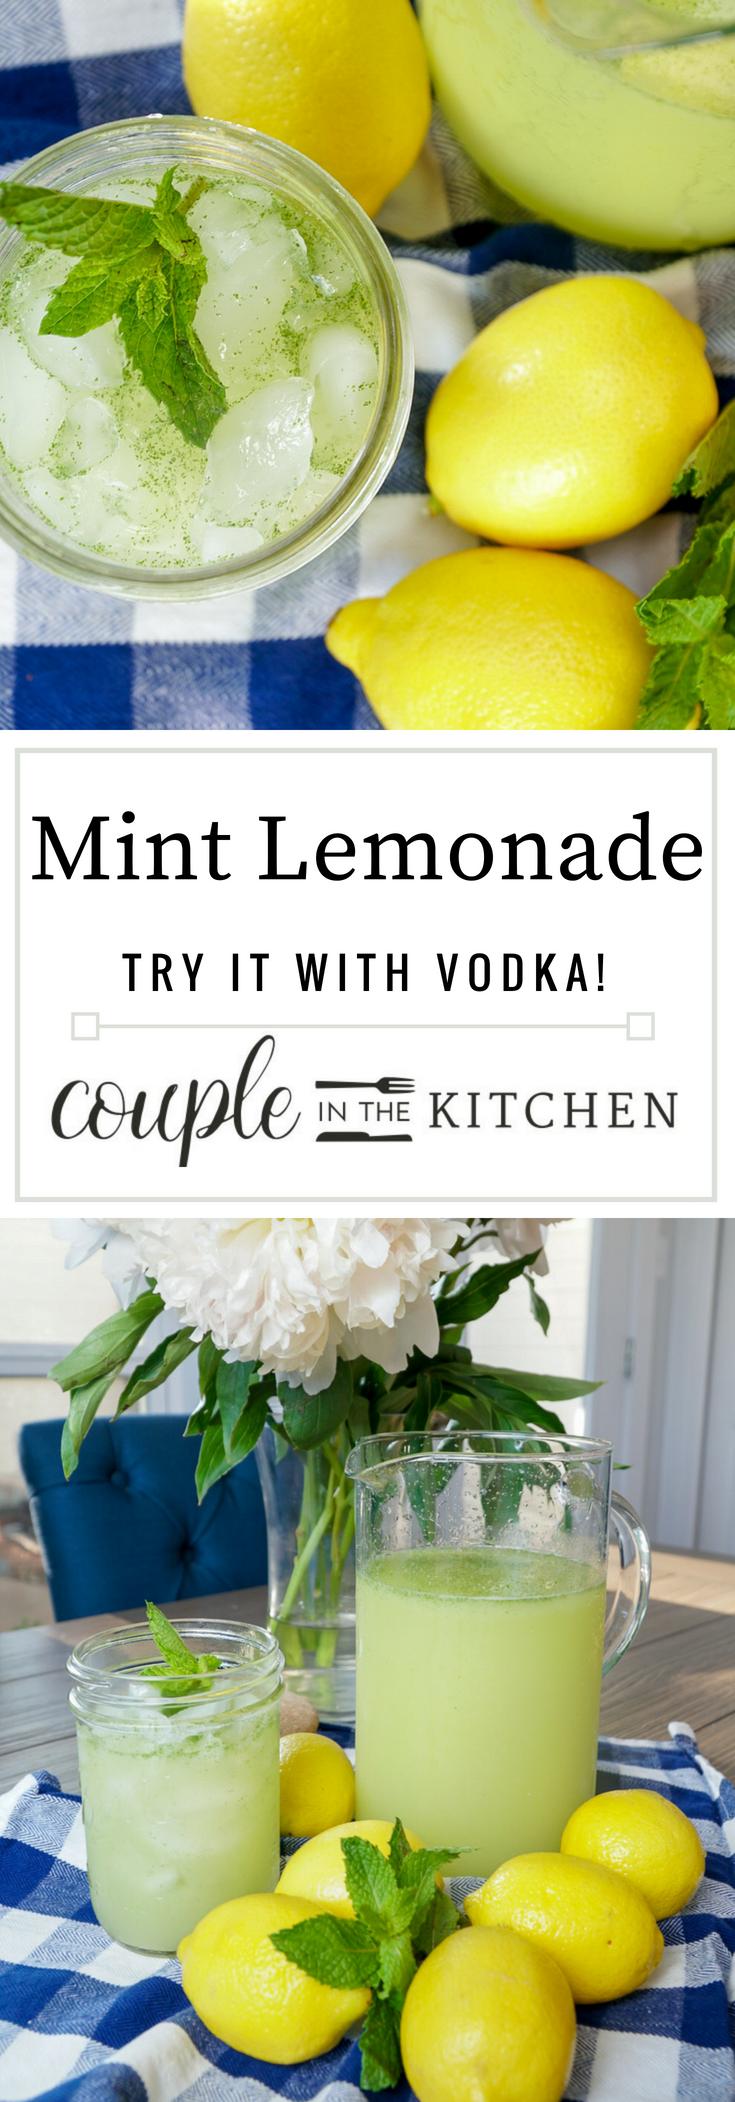 Mint Lemonade Recipe | coupleinthekitchen.com